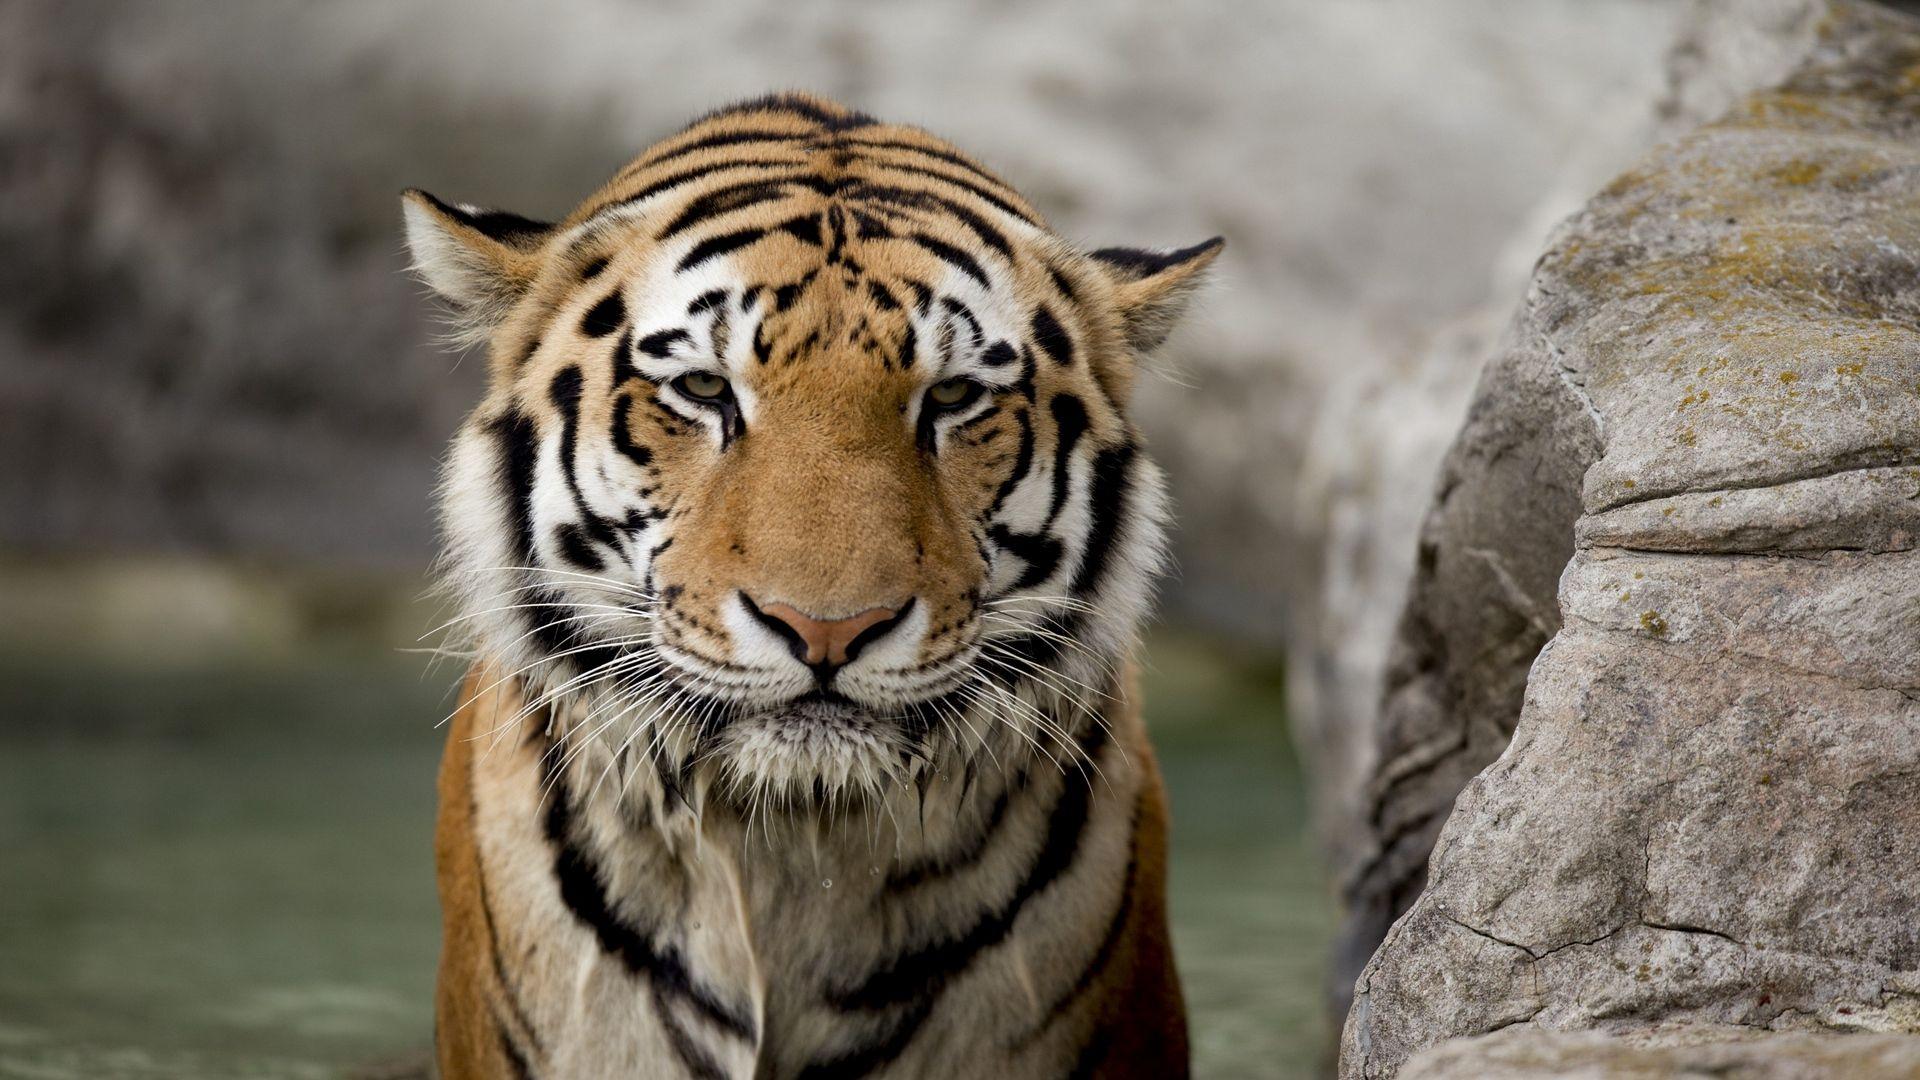 Download Tiger Face Stone Big Cat Wallpaper, Background